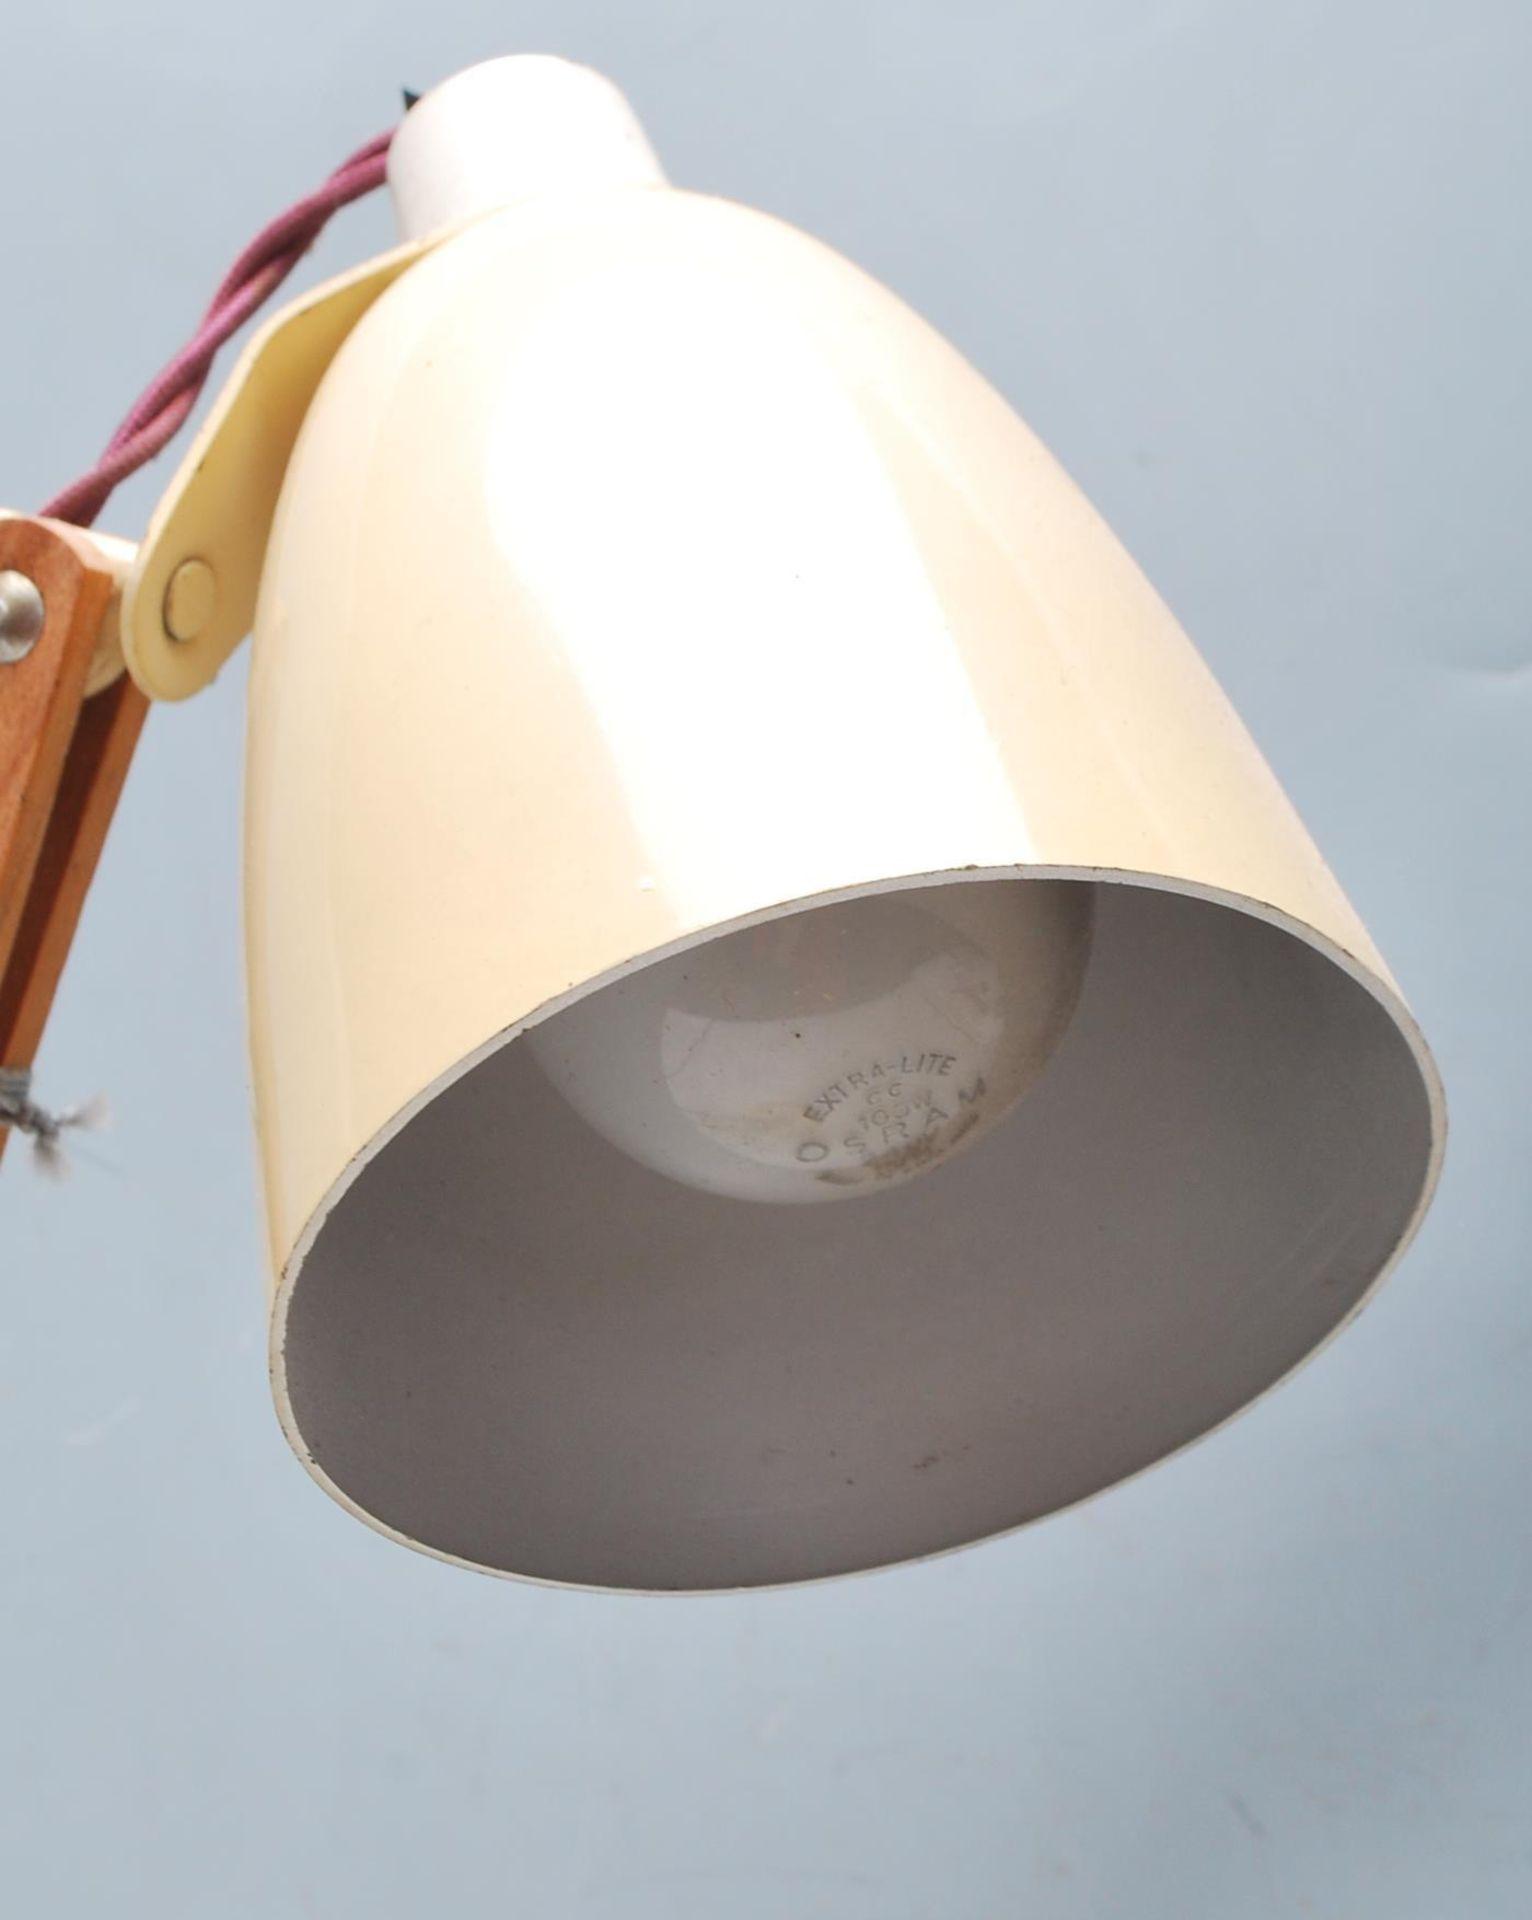 MID CENTURY TERENCE CONRAN MACLAMP DESK LAMP - Image 7 of 7